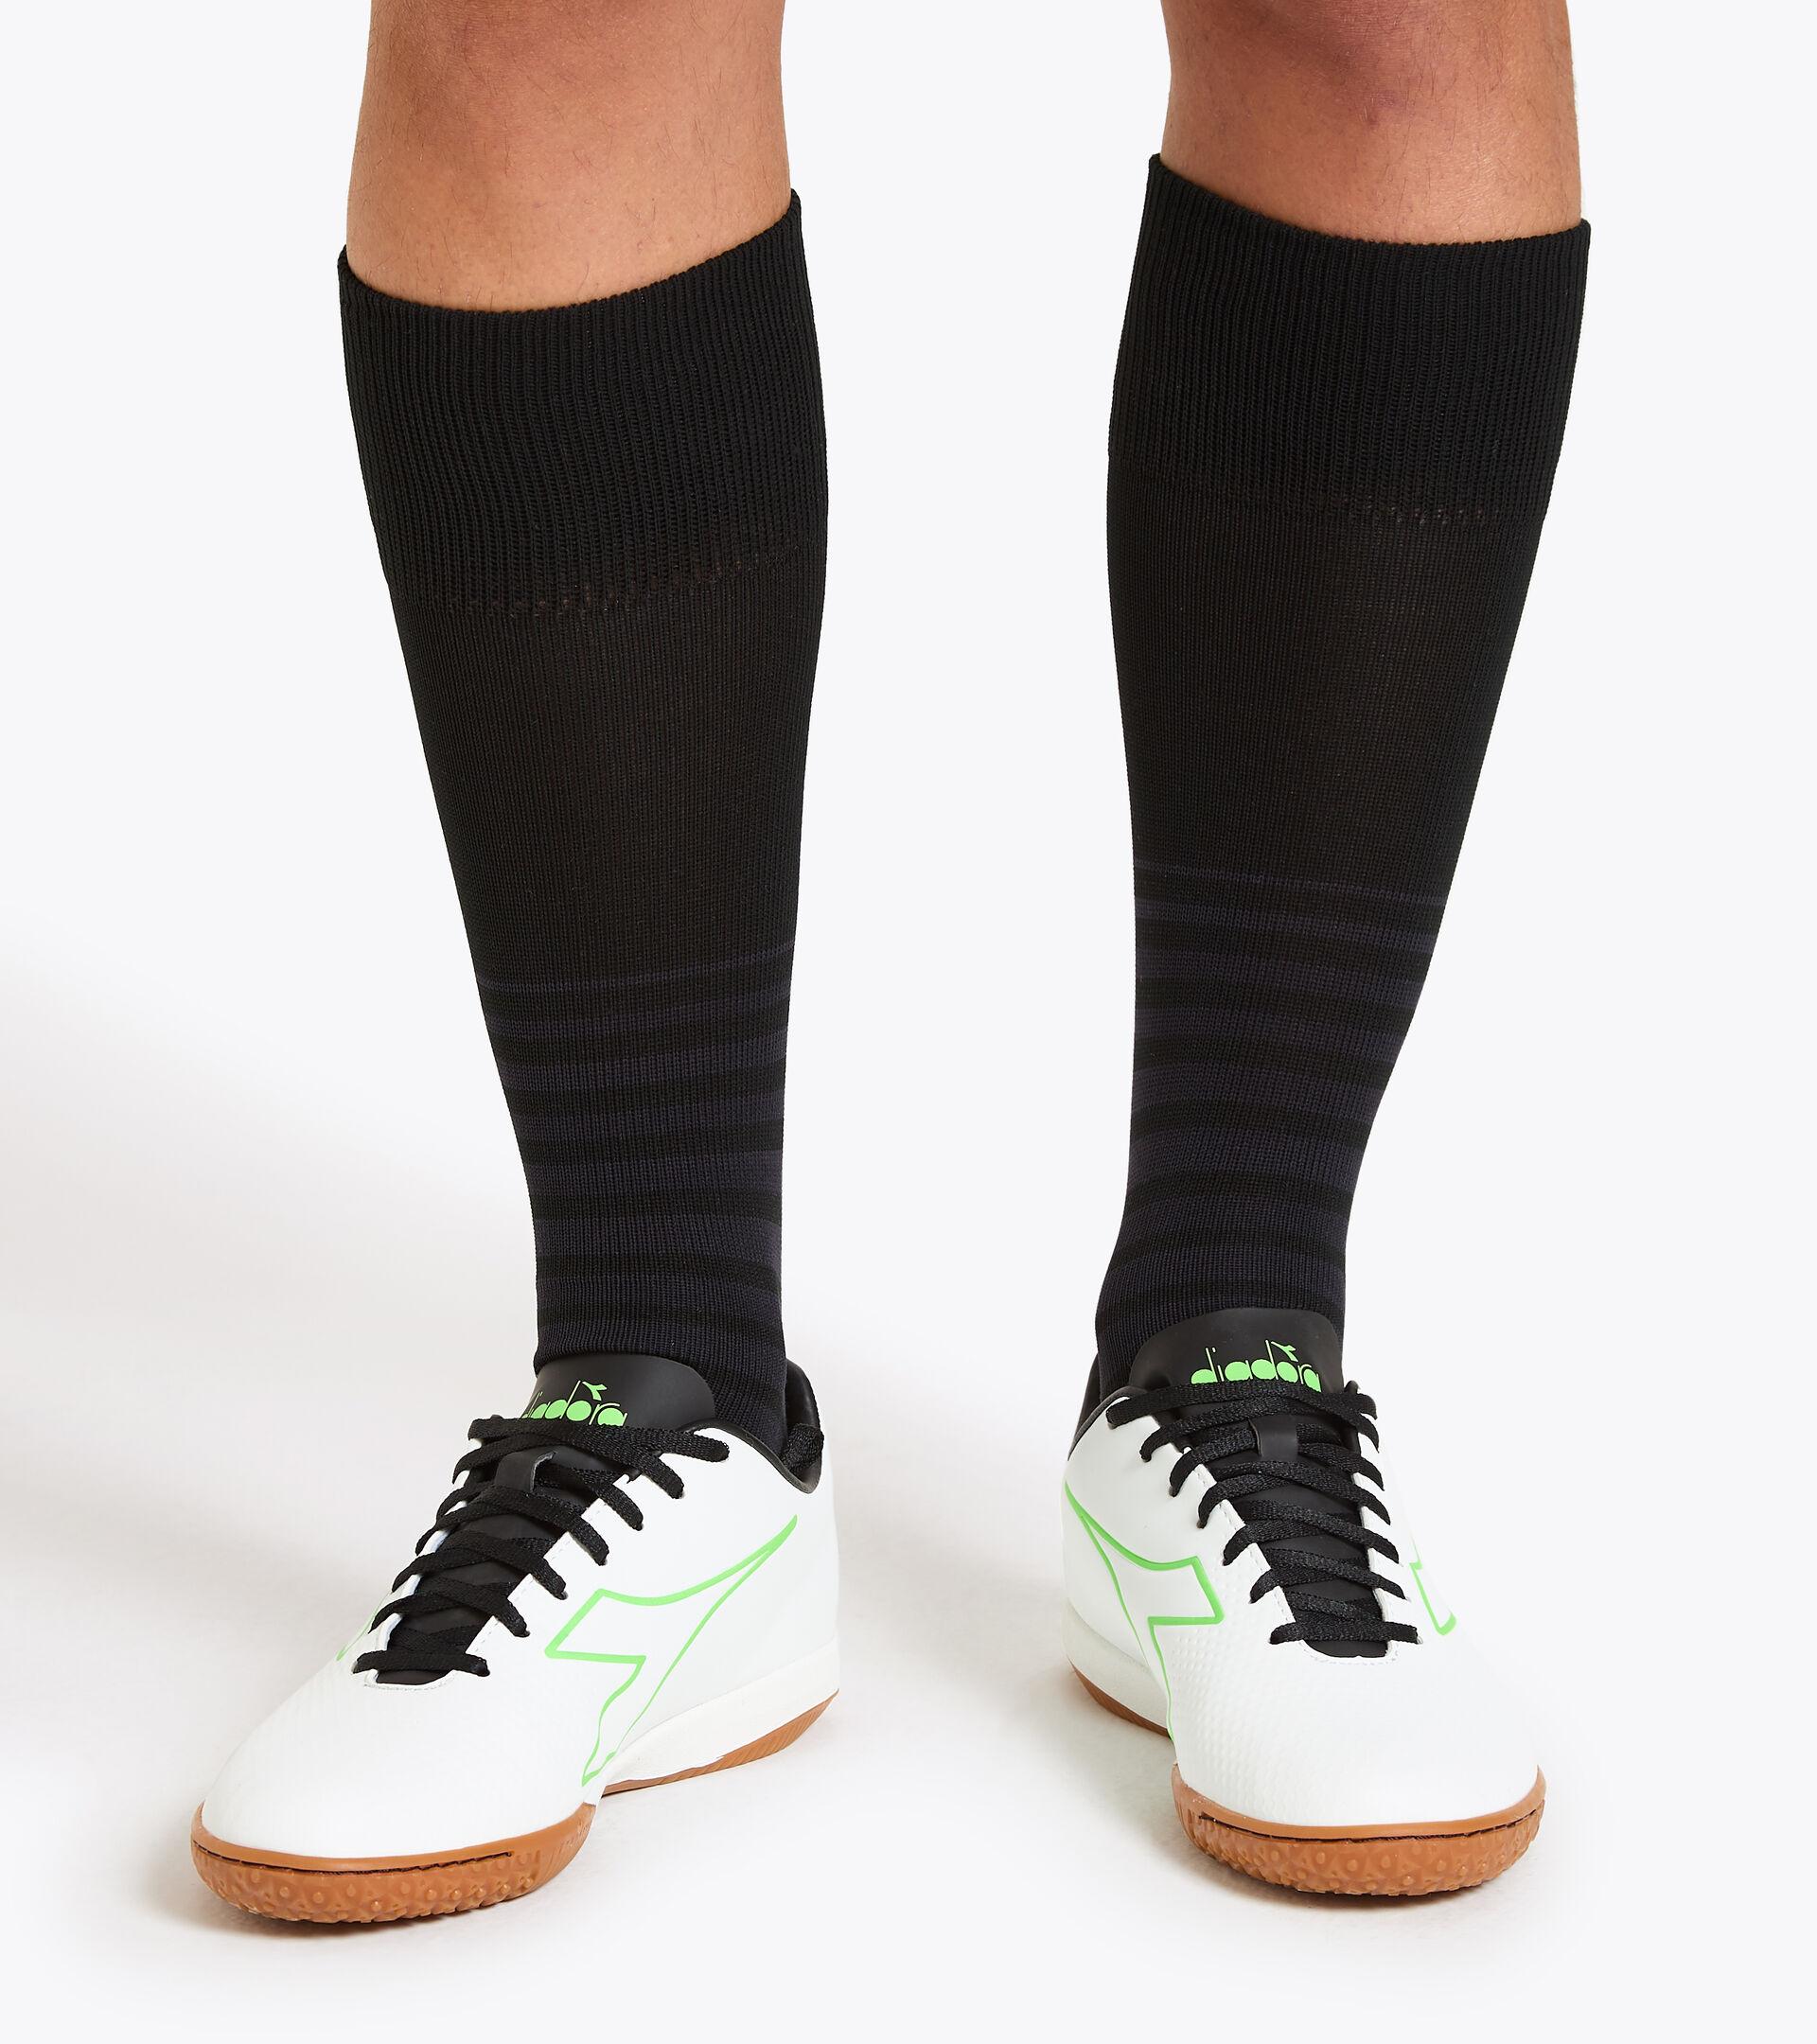 Indoor and parquet court futsal boots PICHICHI 4 IDR WHITE/GREEN FLUO/BLACK - Diadora